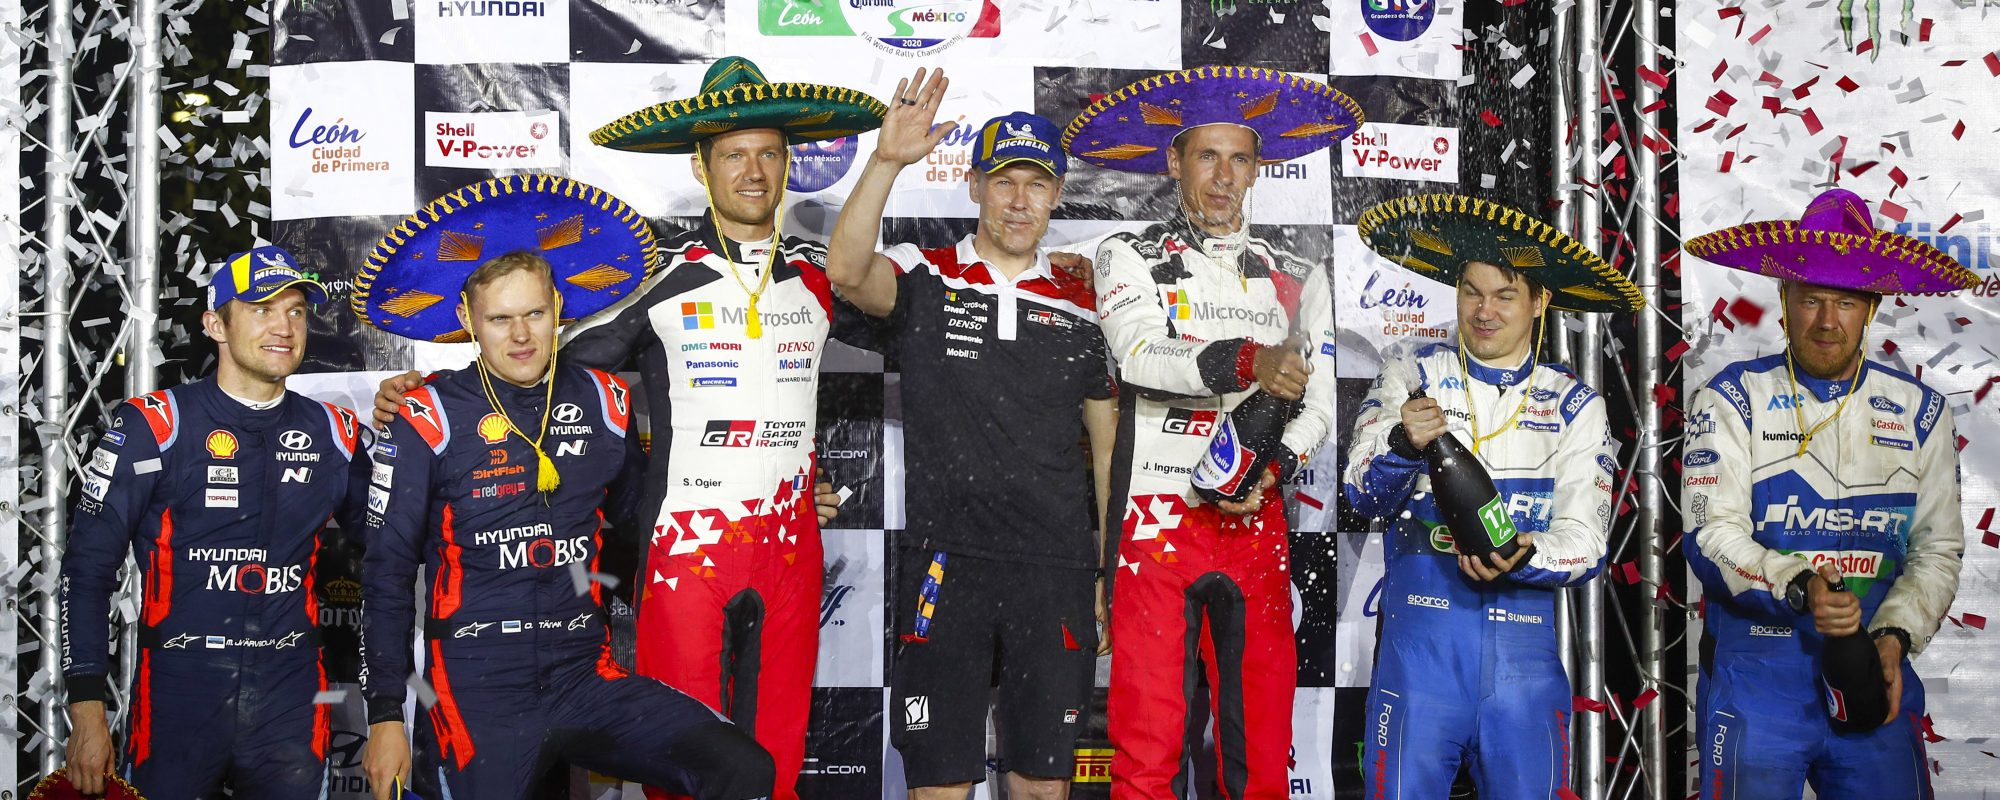 WRC-team Toyota pakt goud tijdens Rally van Mexico